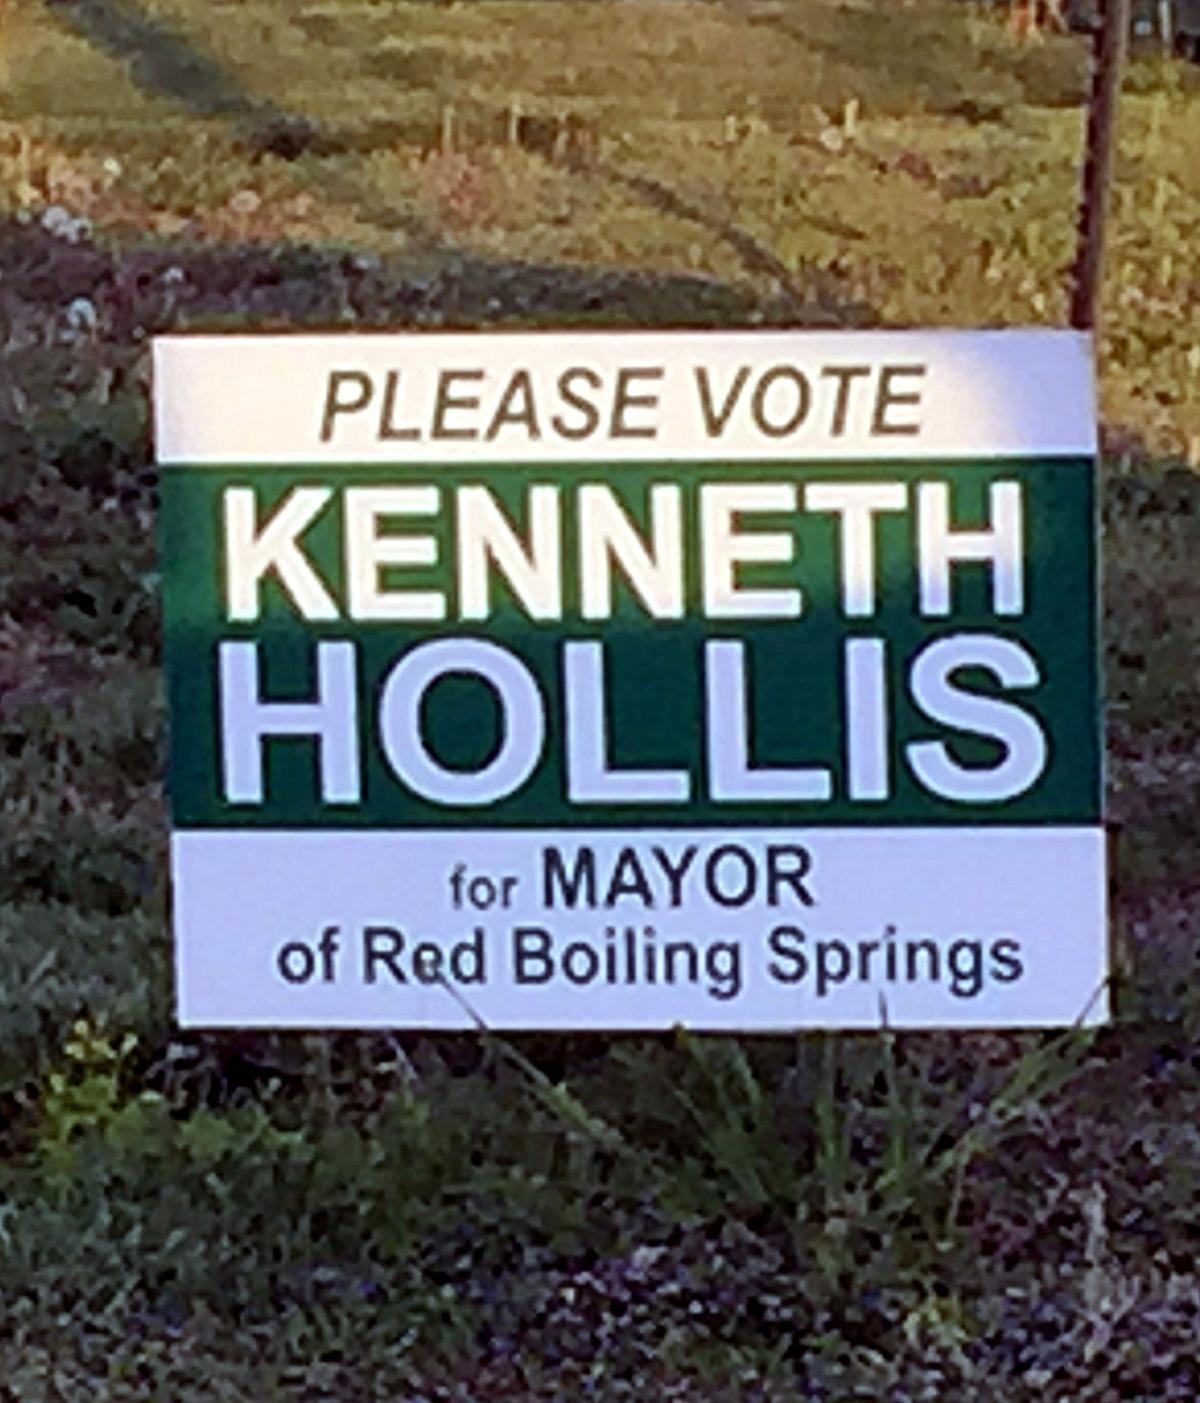 RBS CITY ELECTION PHOTO 2